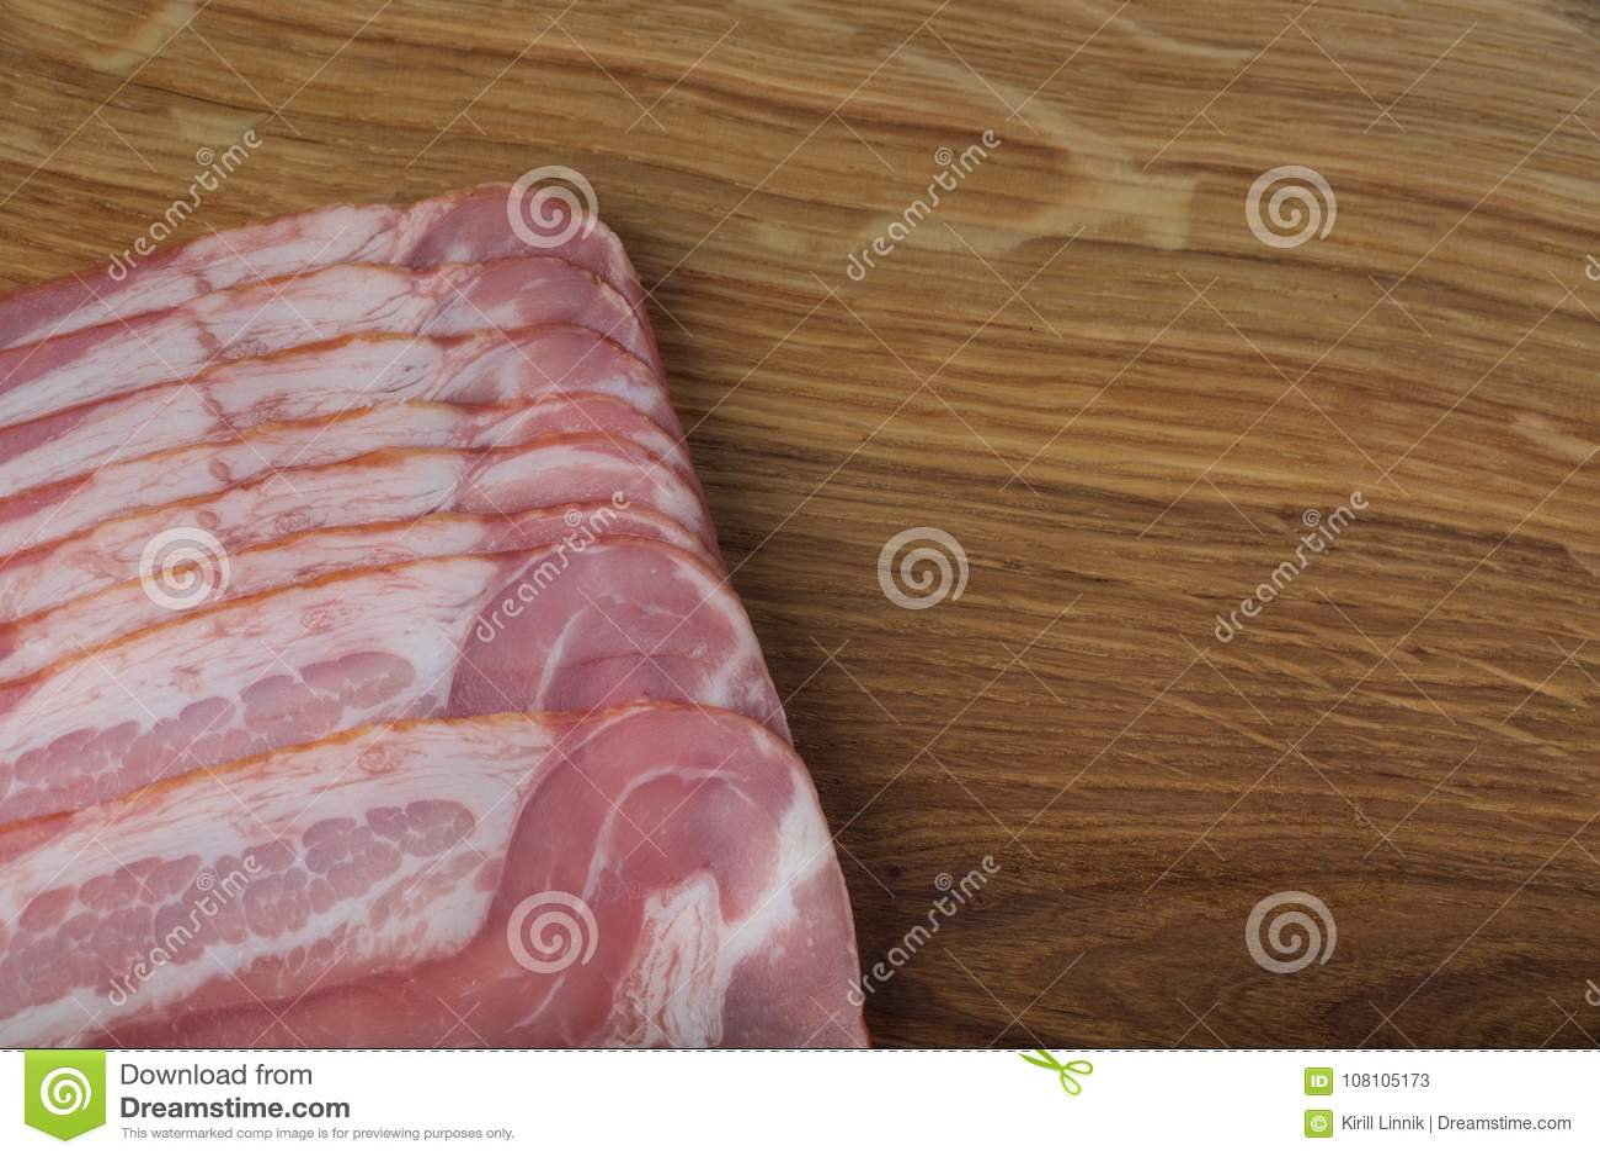 Download Ham on a wooden desk stock image. Image of pink, breakfast - 108105173